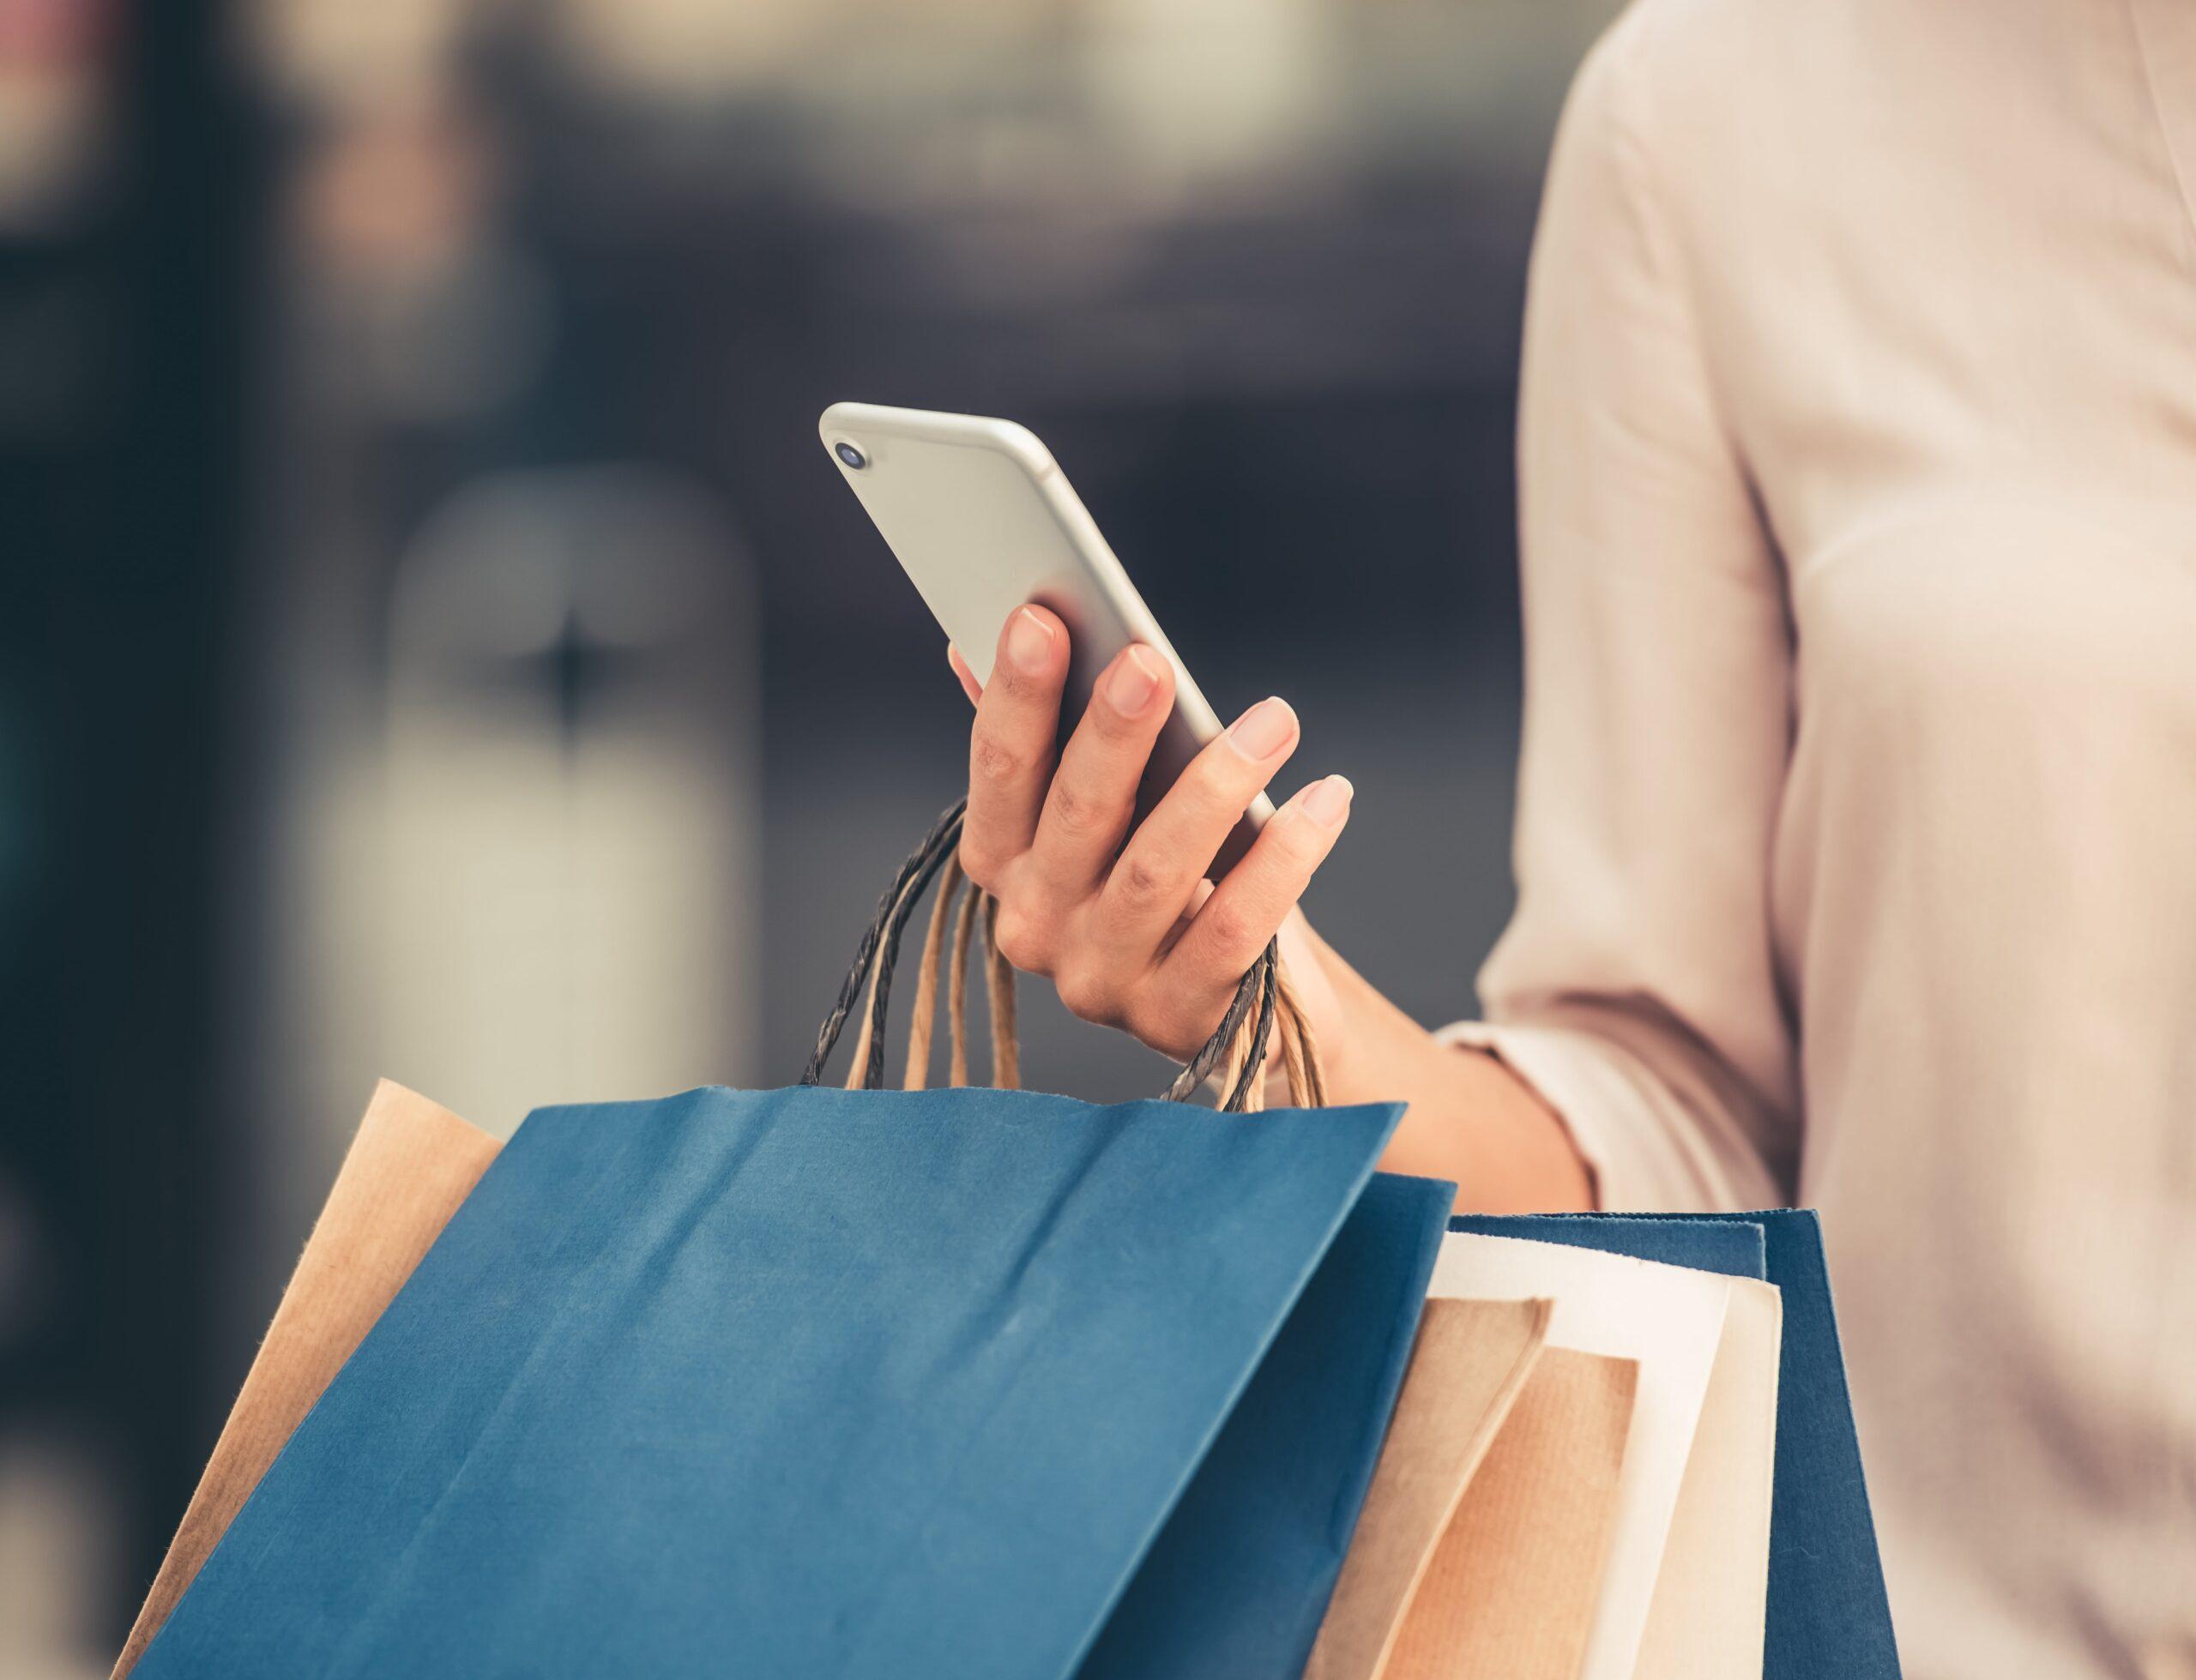 Consumi-shopping-onlife-altavia